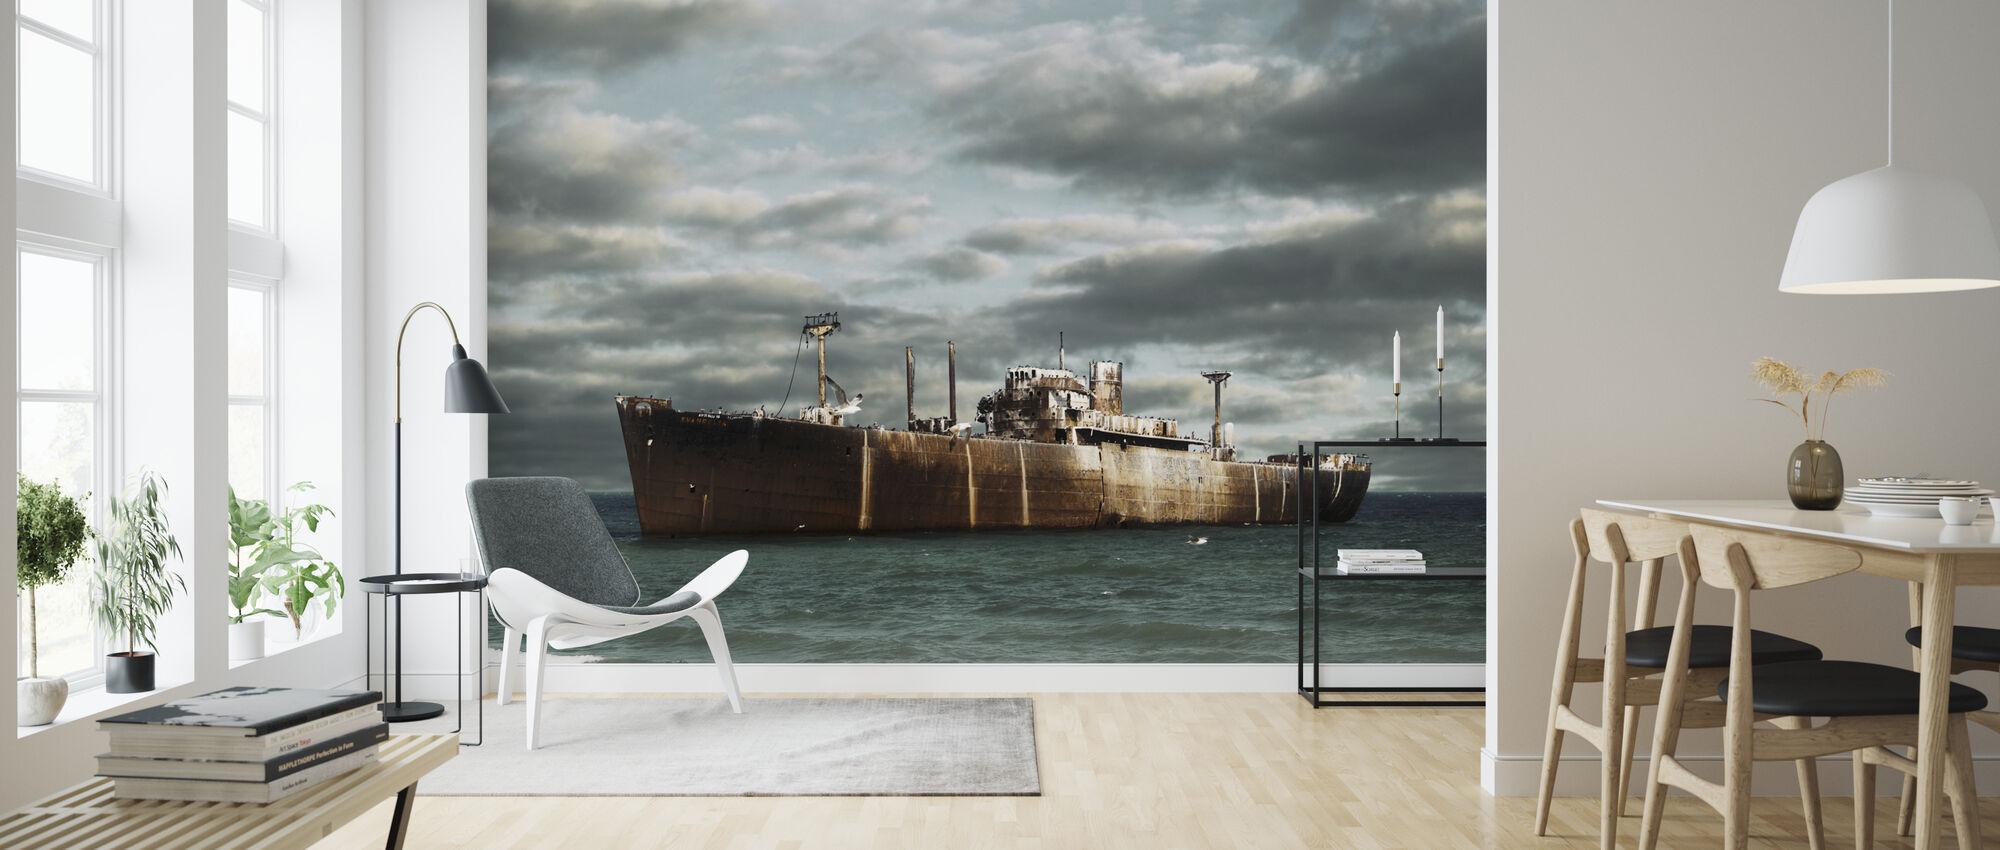 Ship Wreck - Wallpaper - Living Room